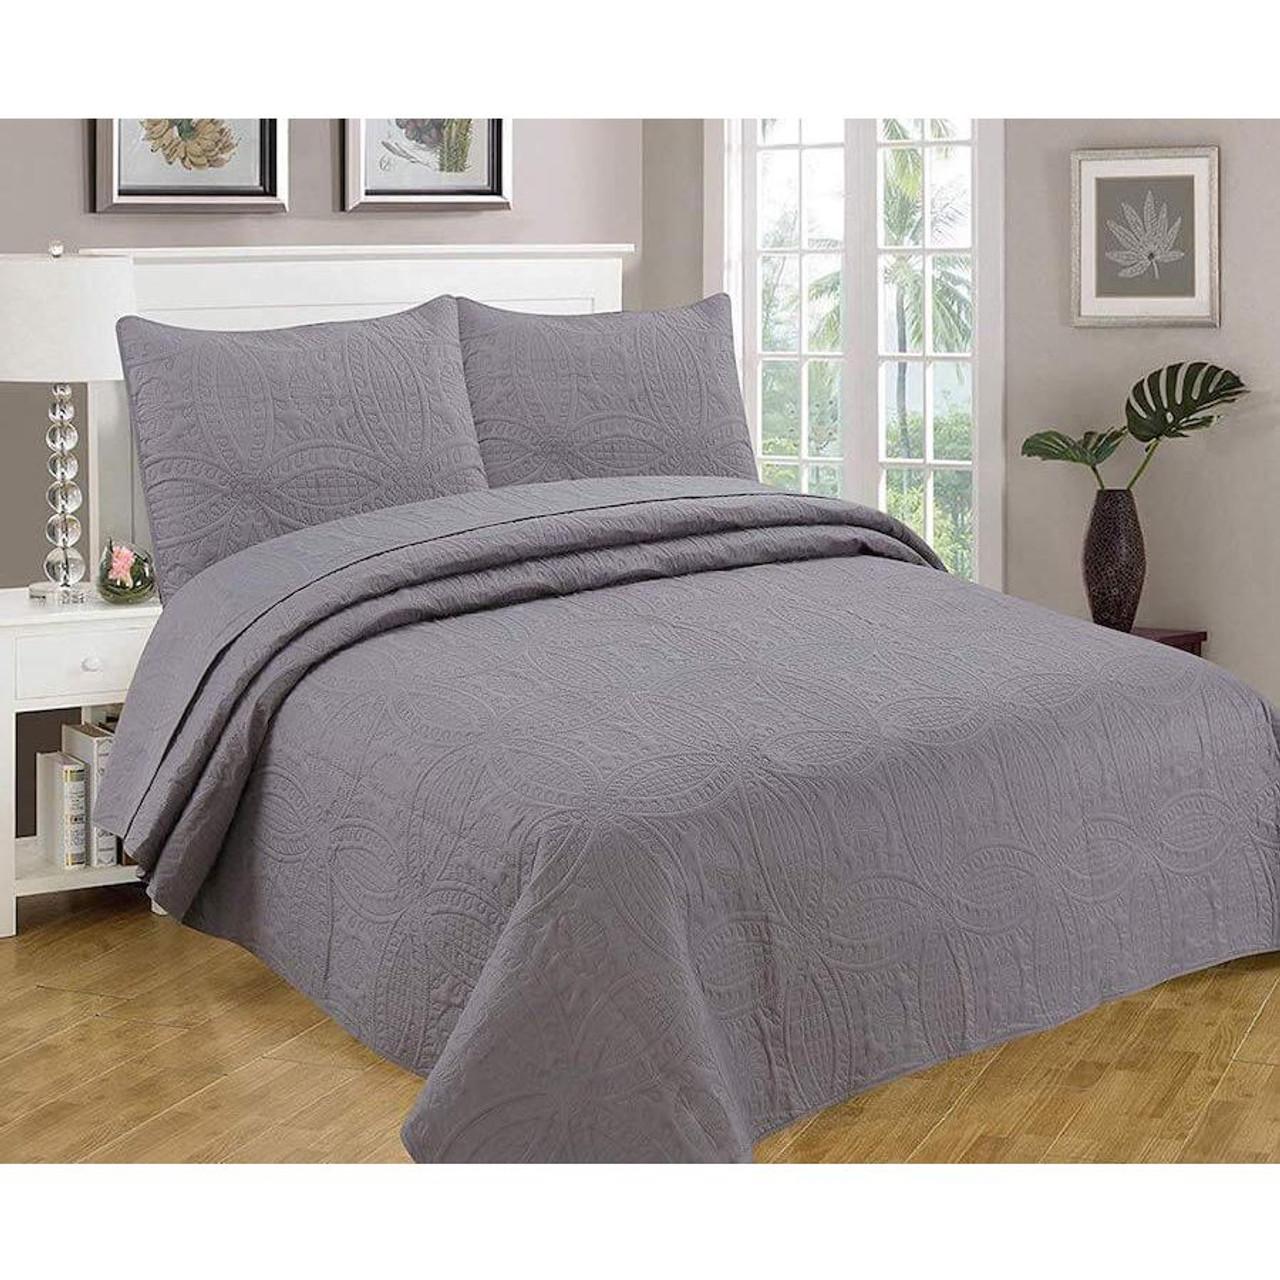 3 Pc Oversized Bedspread Coverlet Set Charcoal Color